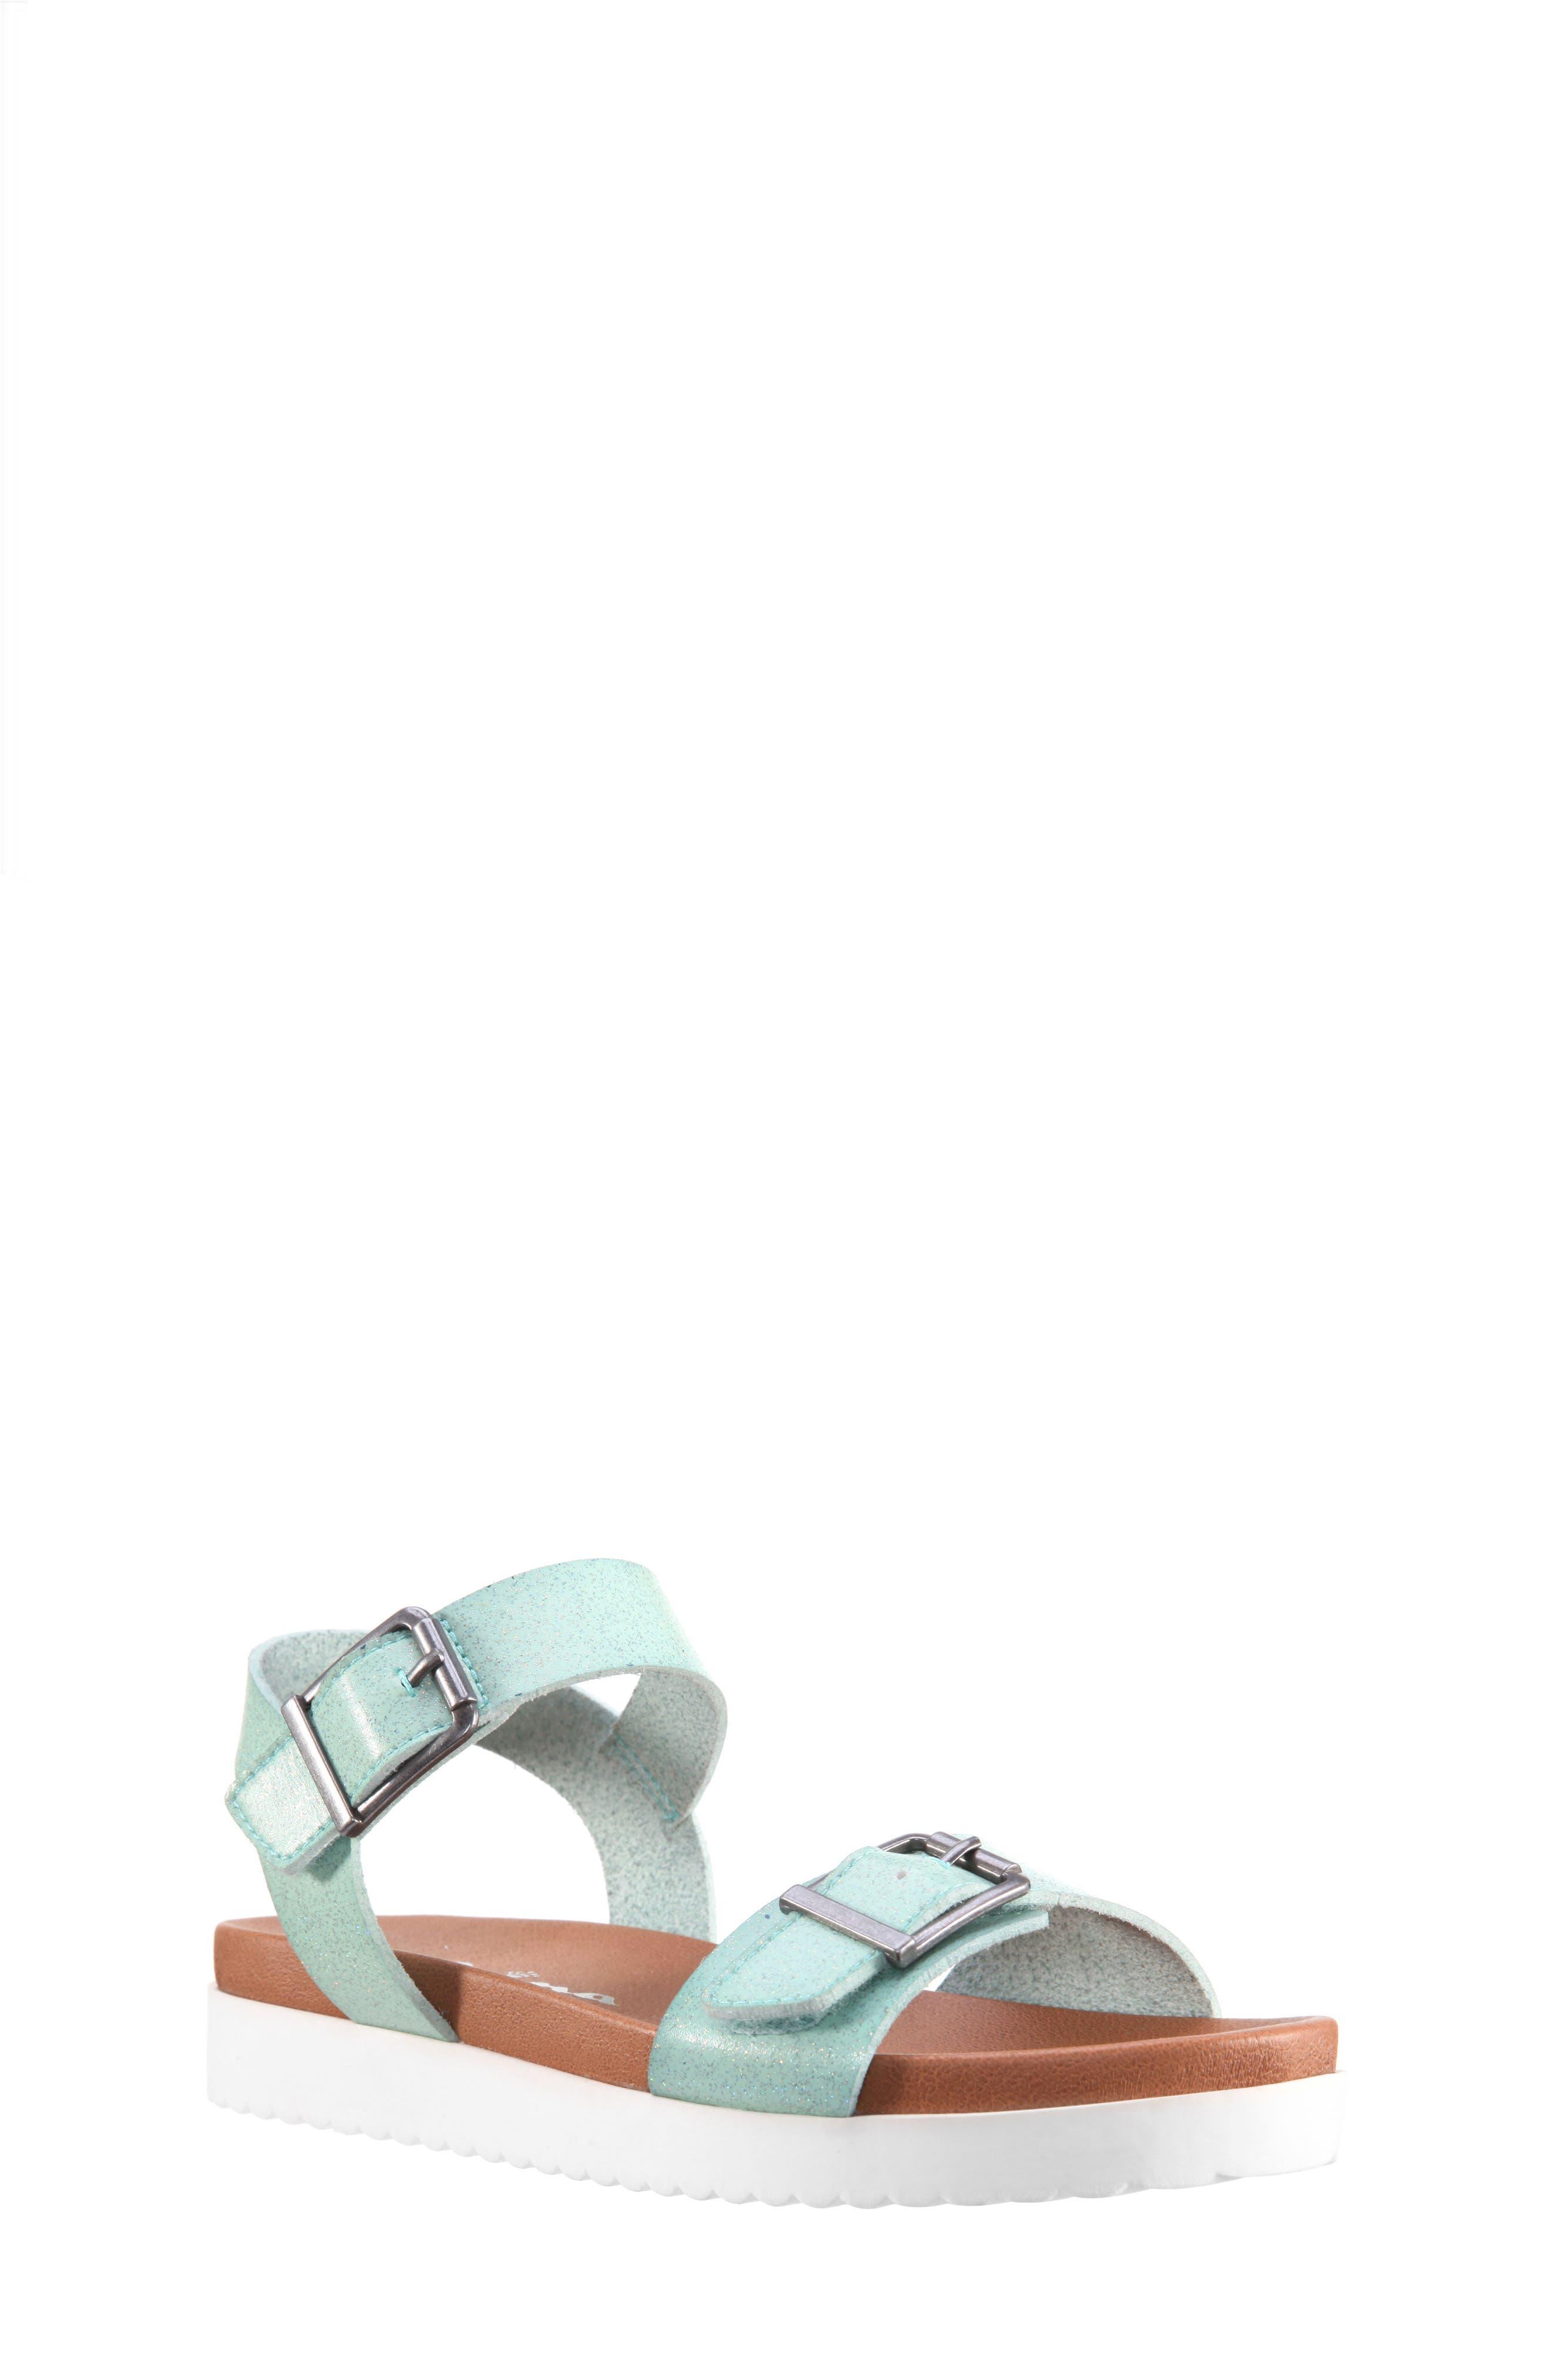 Jacklin3 Quarter Strap Sandal,                         Main,                         color, Mint Dip Dye